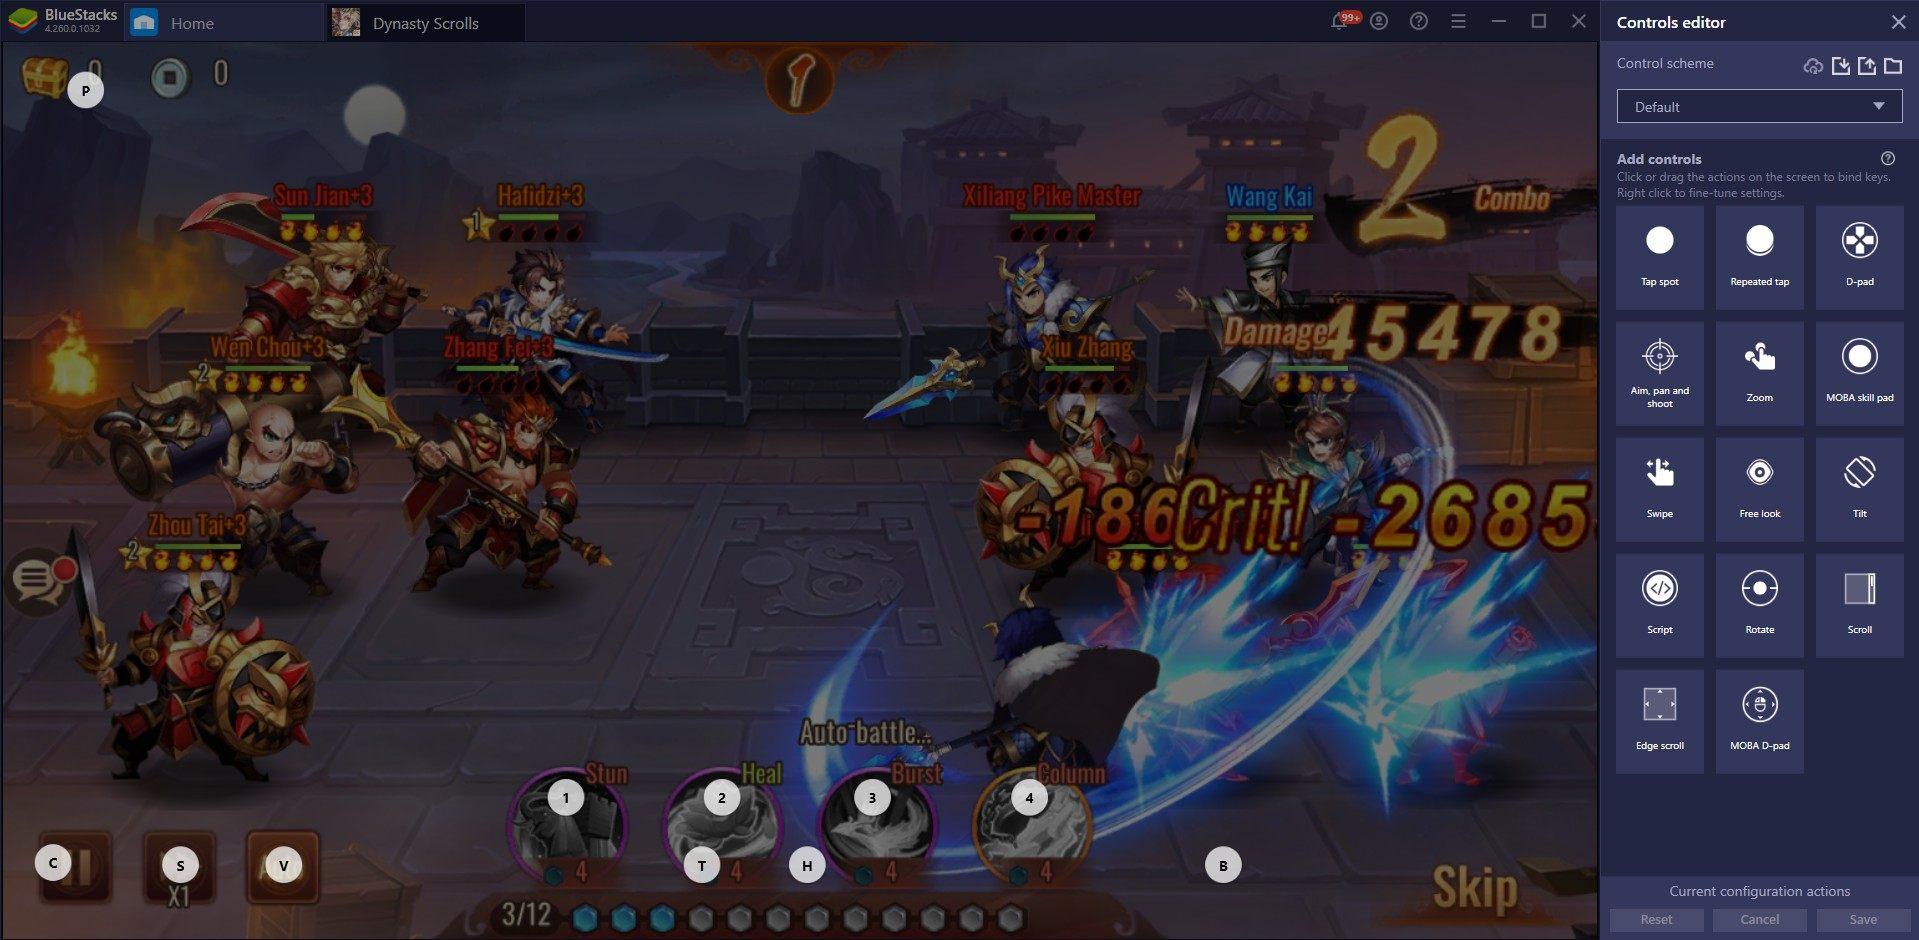 Cara Asyik Main Dynasty Scrolls di PC